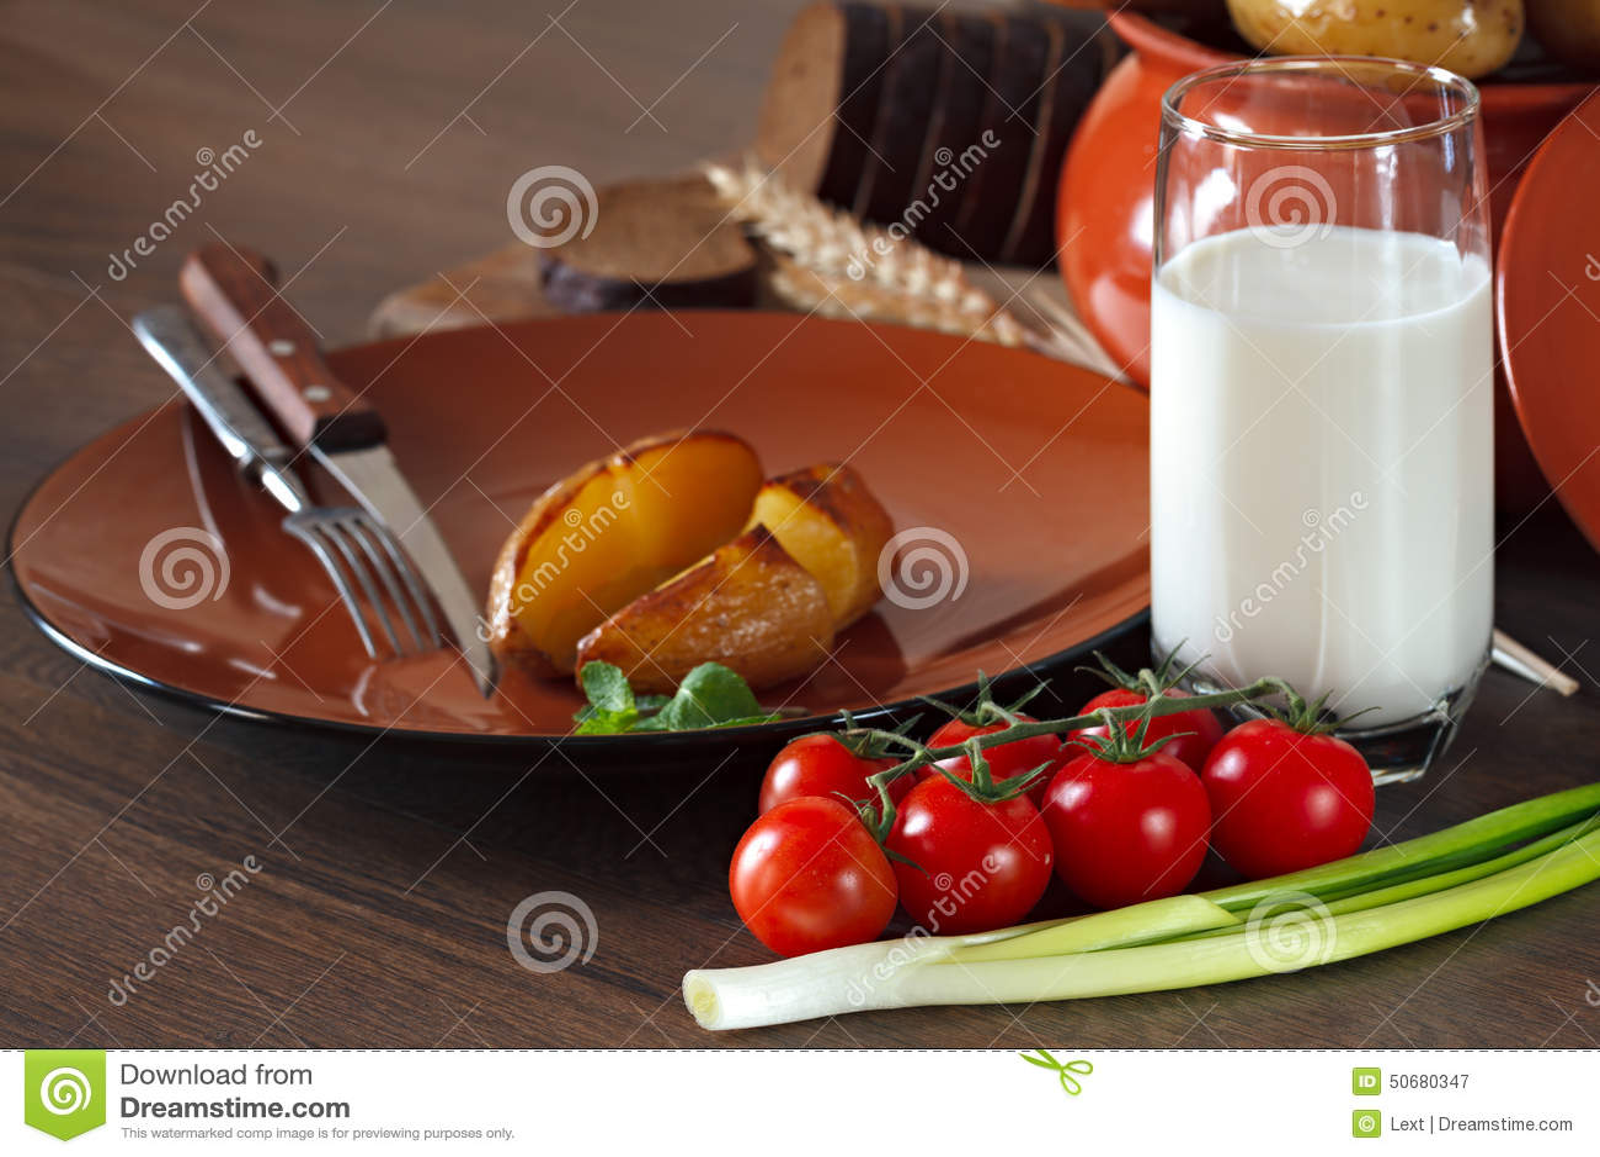 Download 在瓦器的被烘烤的土豆在桌上 库存图片. 图片 包括有 食物, 美食术, 牛奶, 玻璃, 午餐, 菜单, 叉子 - 50680347